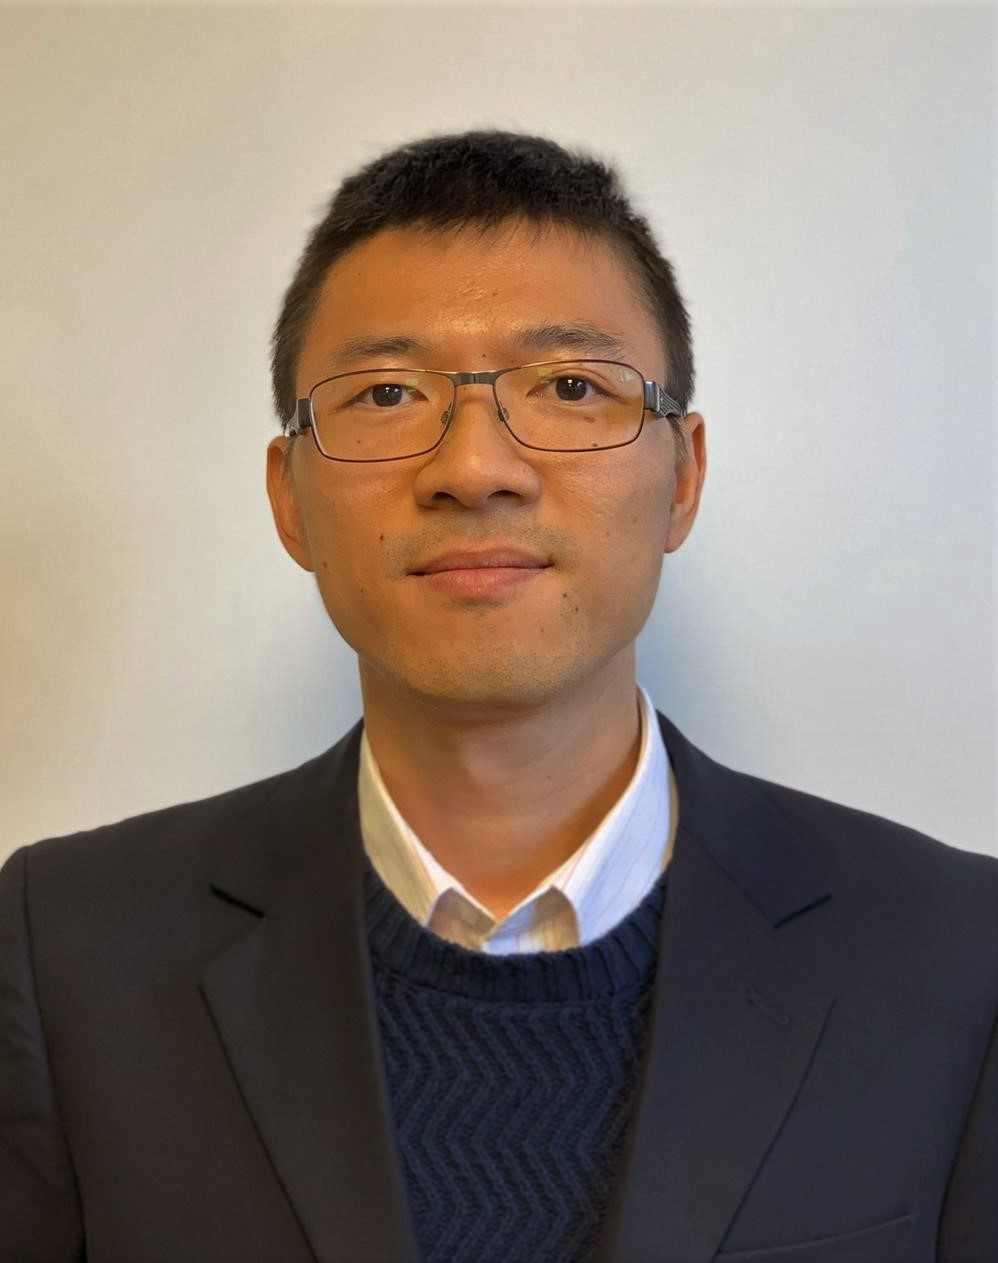 Harry To - Marketing Manager - Vietnam, Aspire2 International